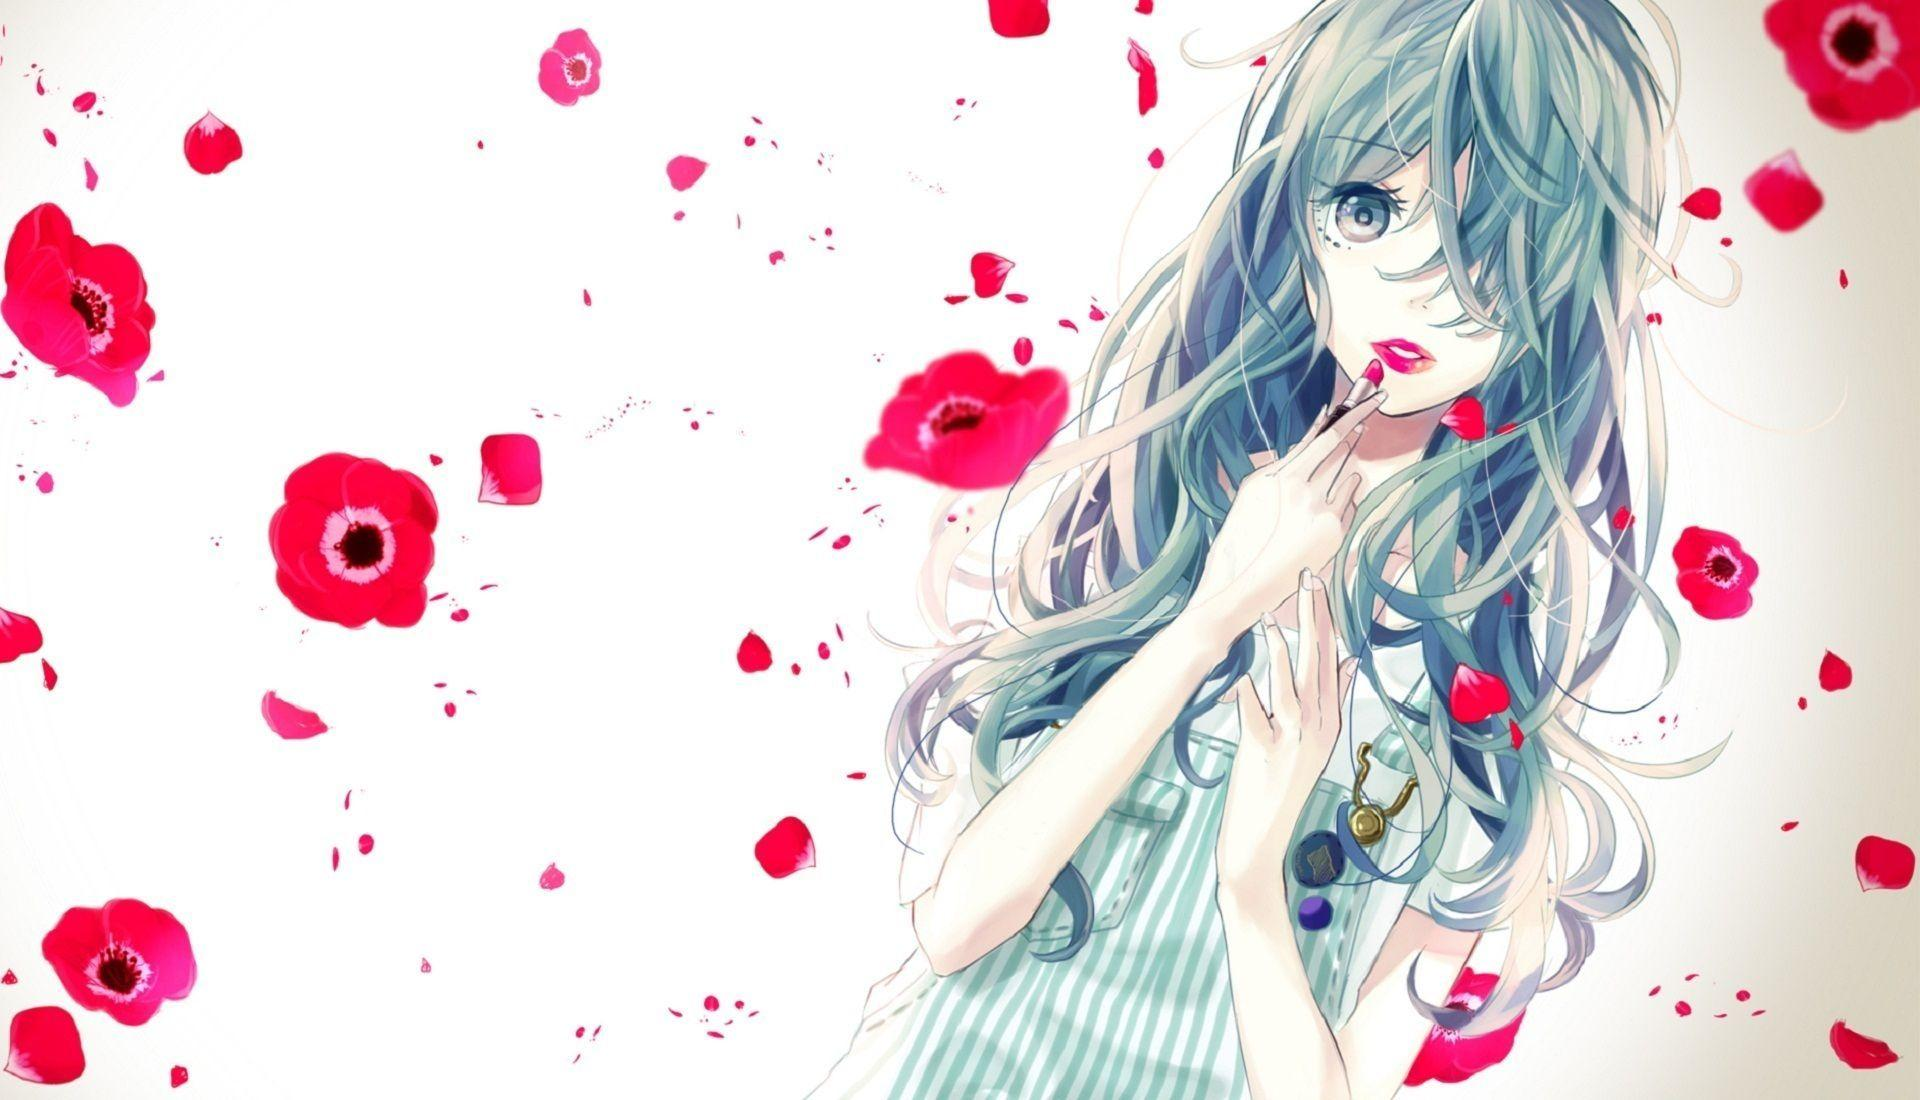 cute anime girl moka wallpaper - photo #37